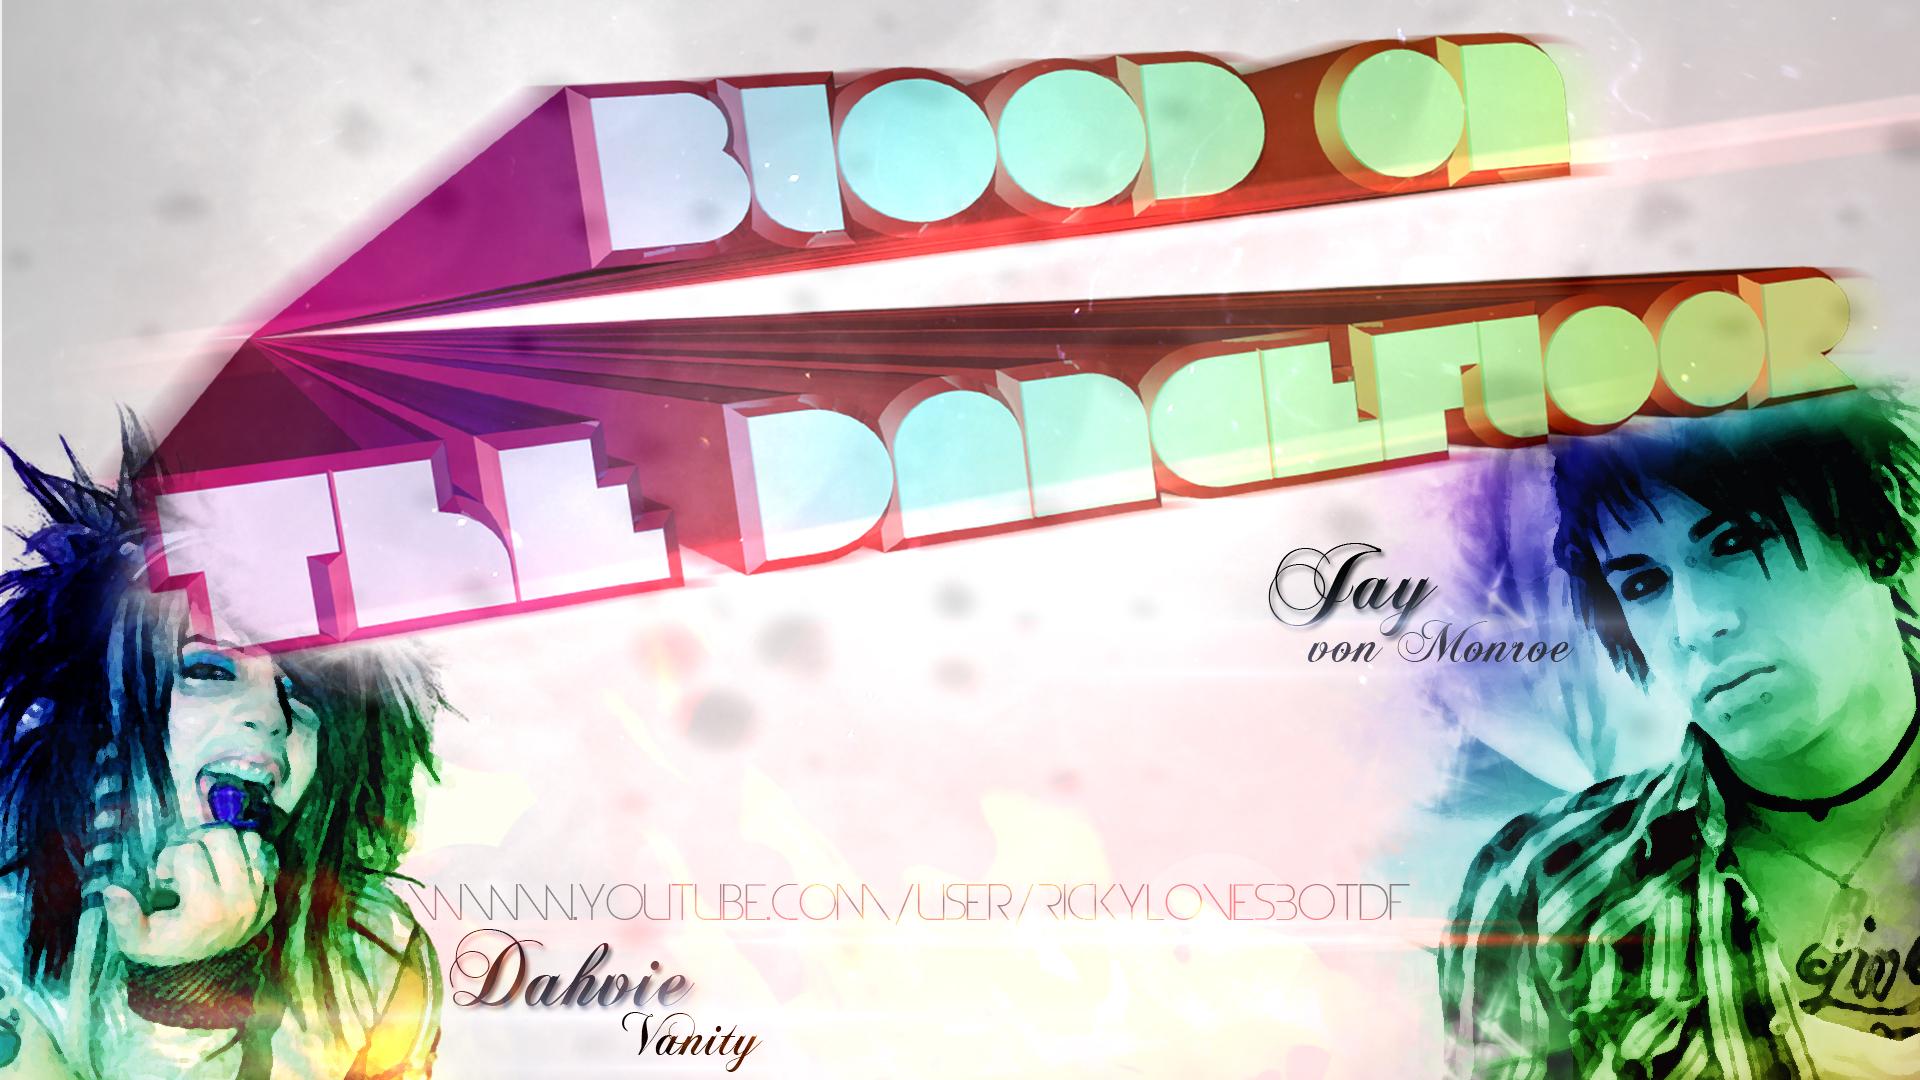 BODF WALLPAPER   Blood on The Dance Floor Wallpaper 1920x1080